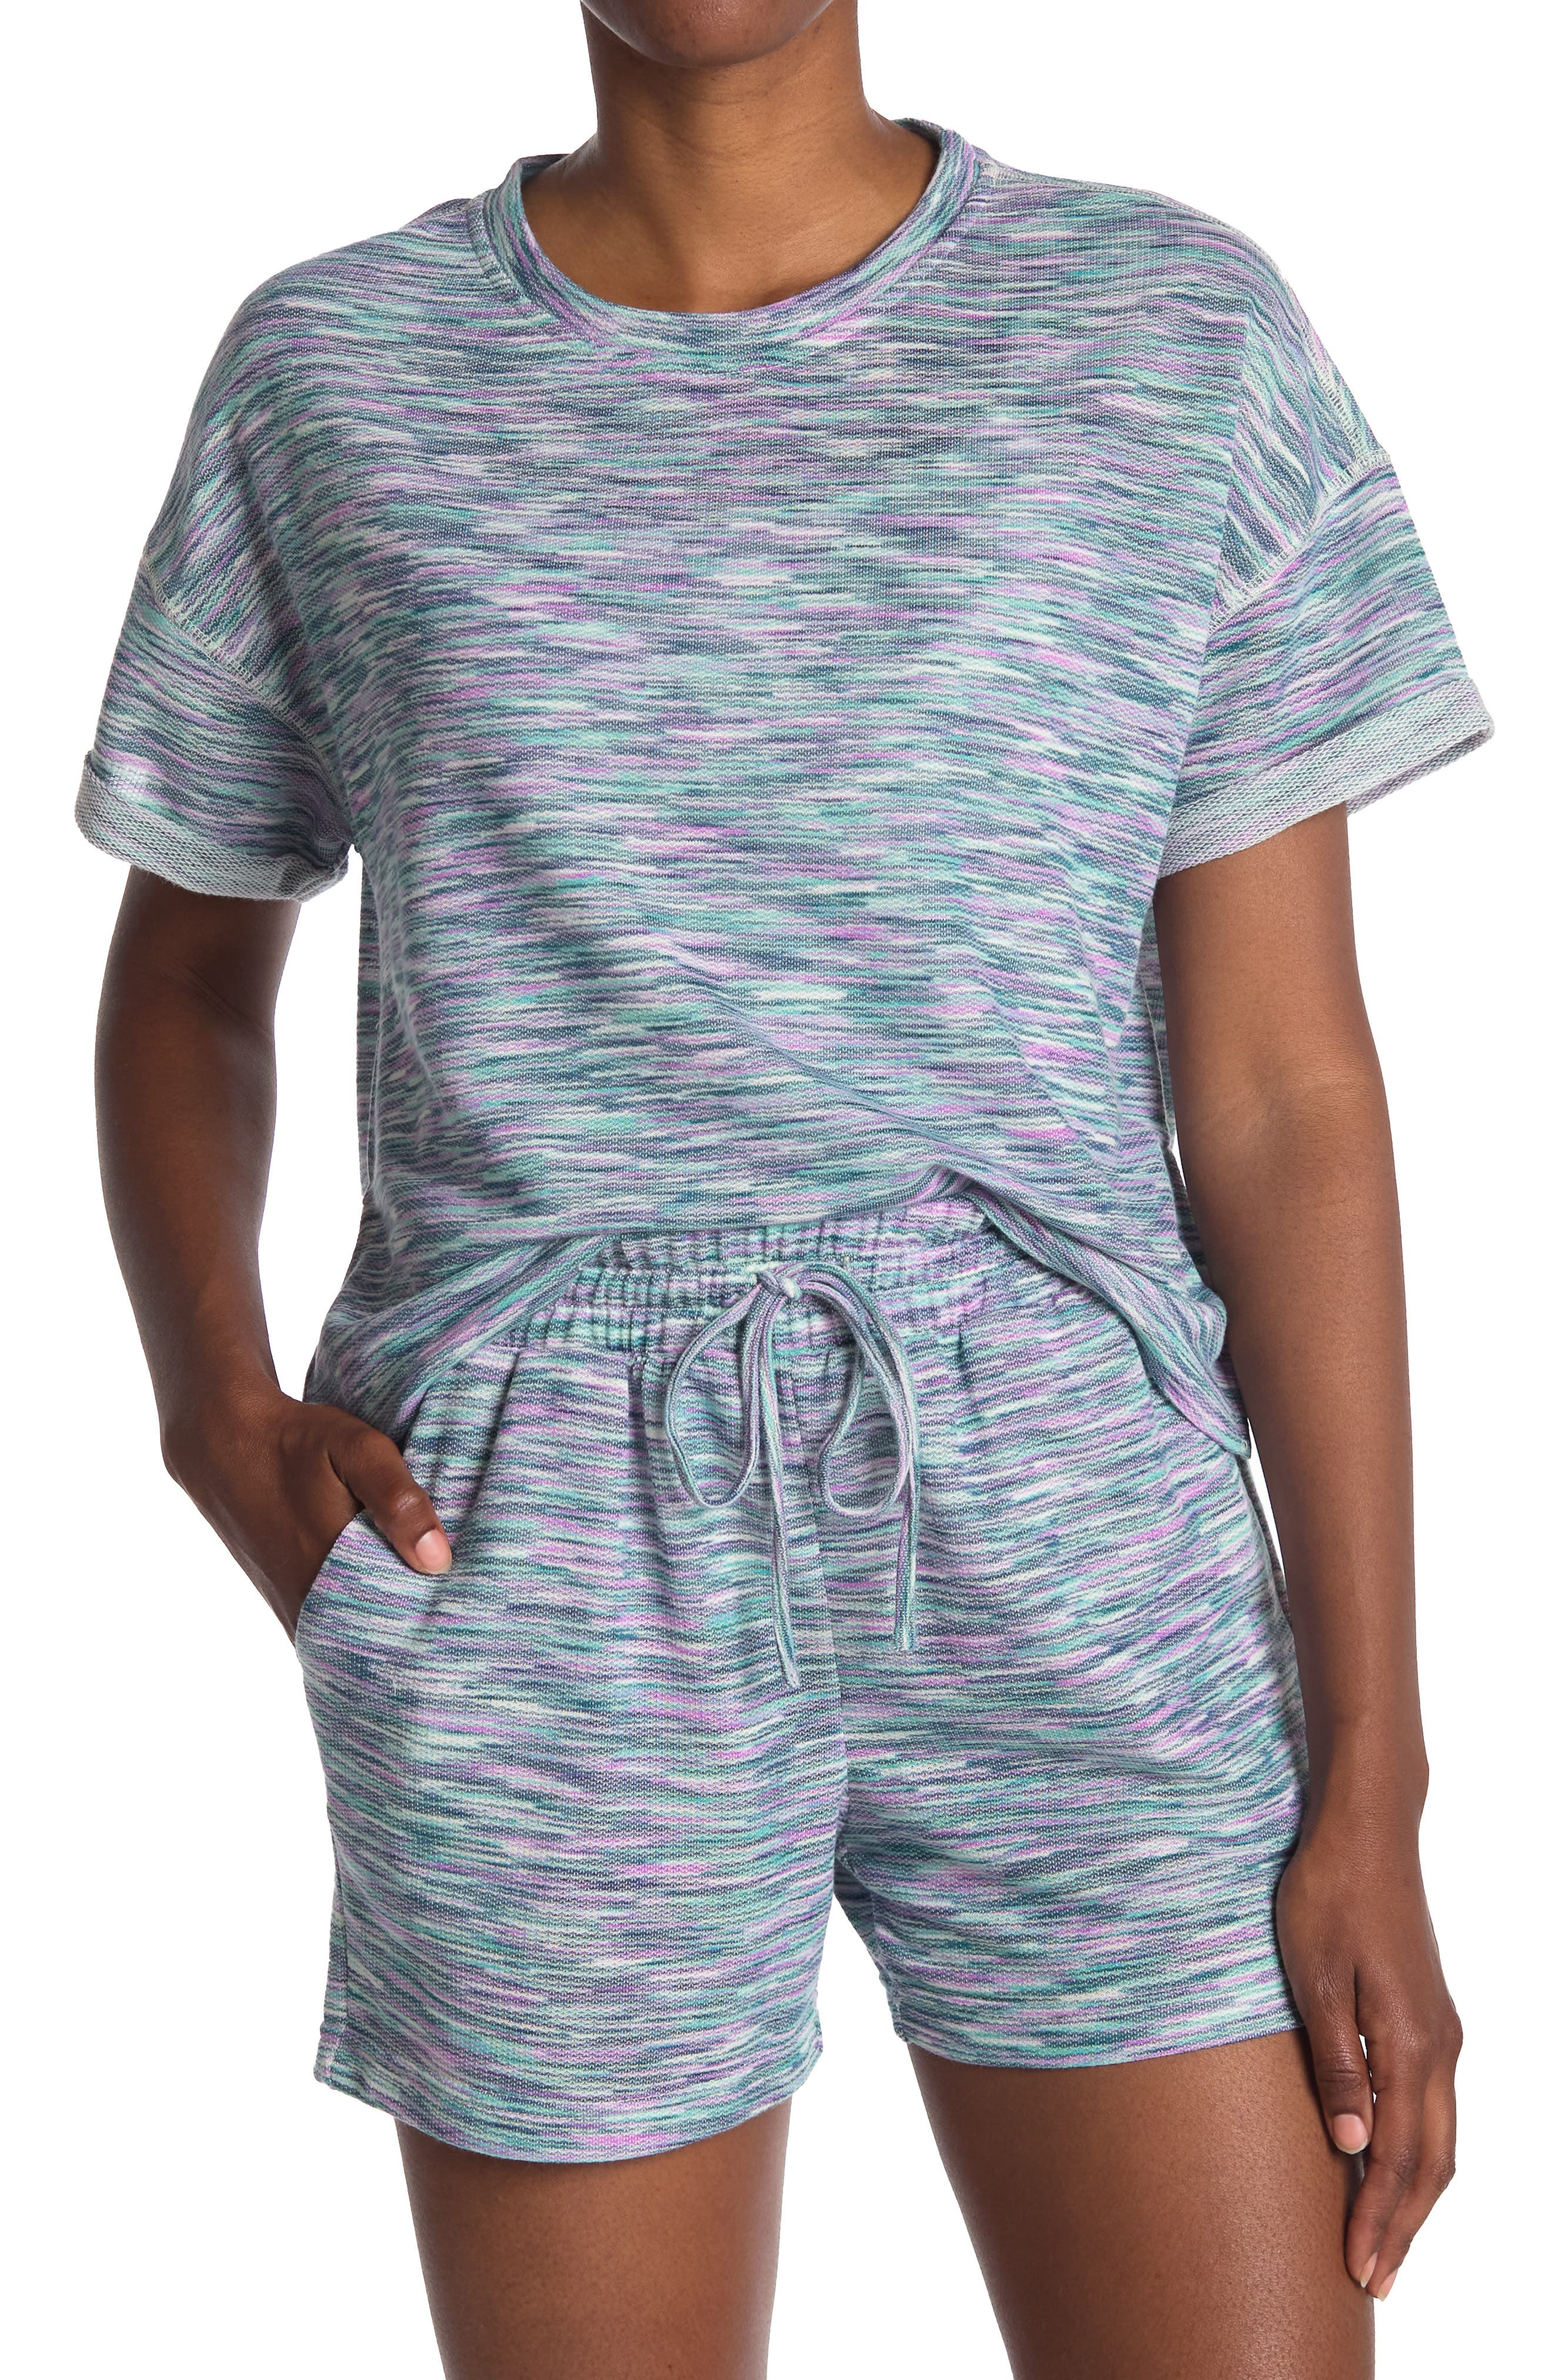 Melloday Space Dye Terry Knit Crop Top In Open Blue34